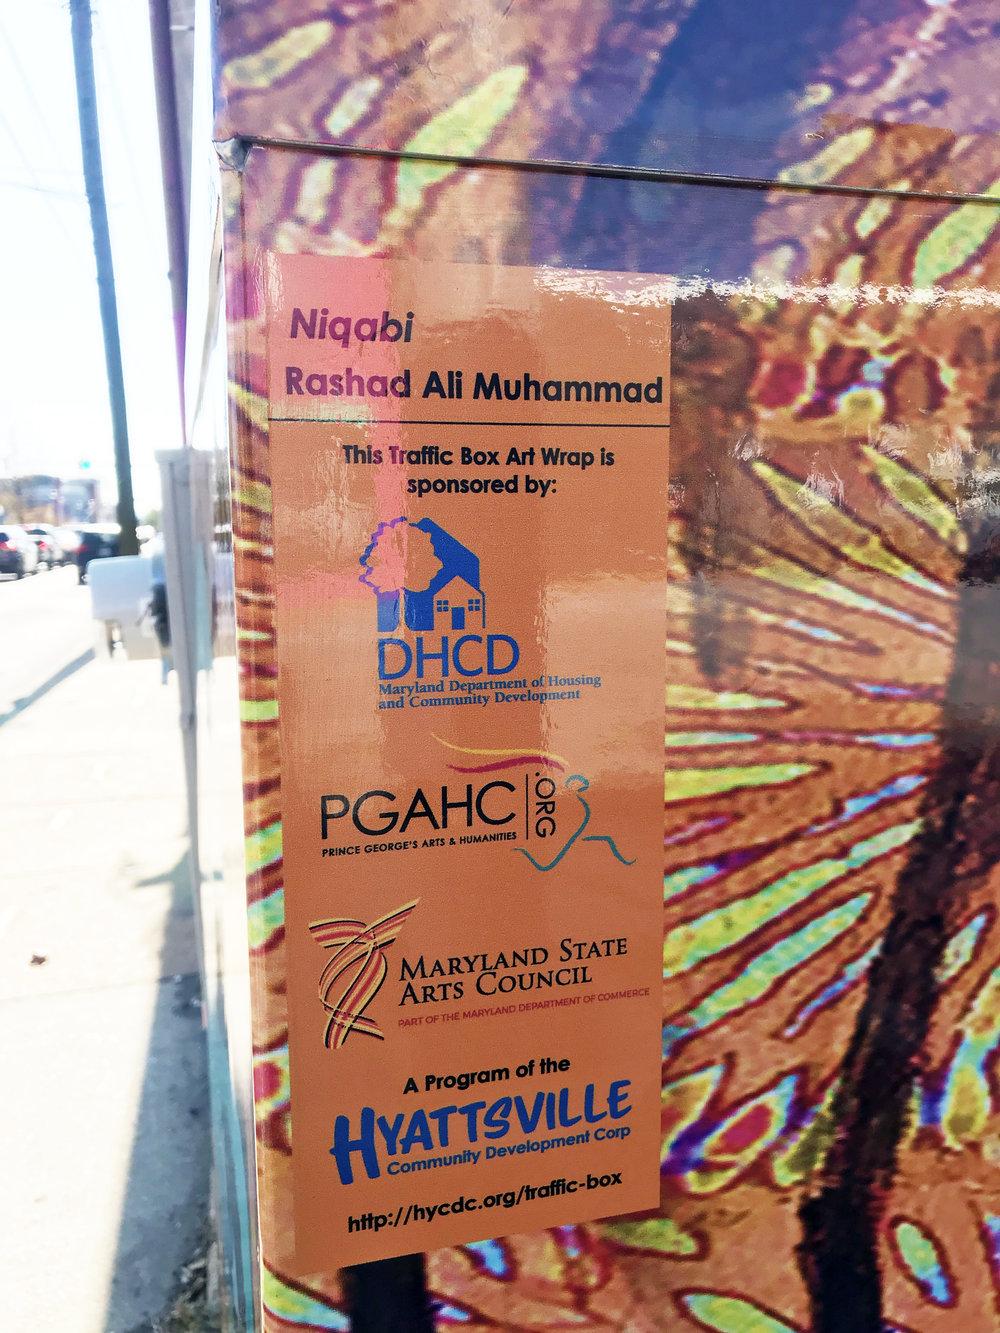 rashad ali muhammad traffic box art wrap